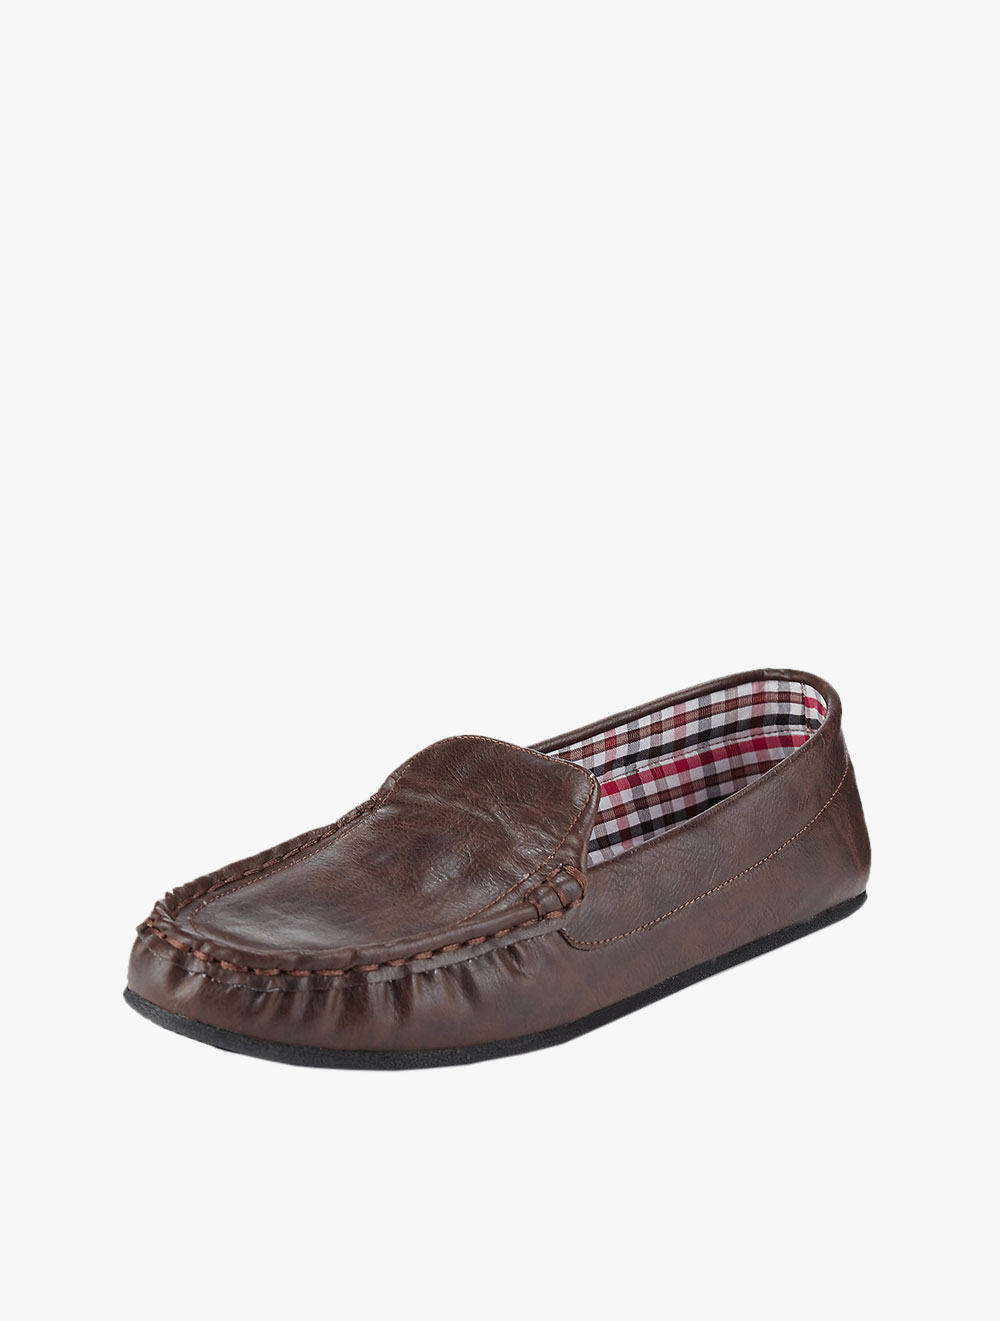 Your Br Kicks Get Slip Rockport Men's on OiukXZTwP